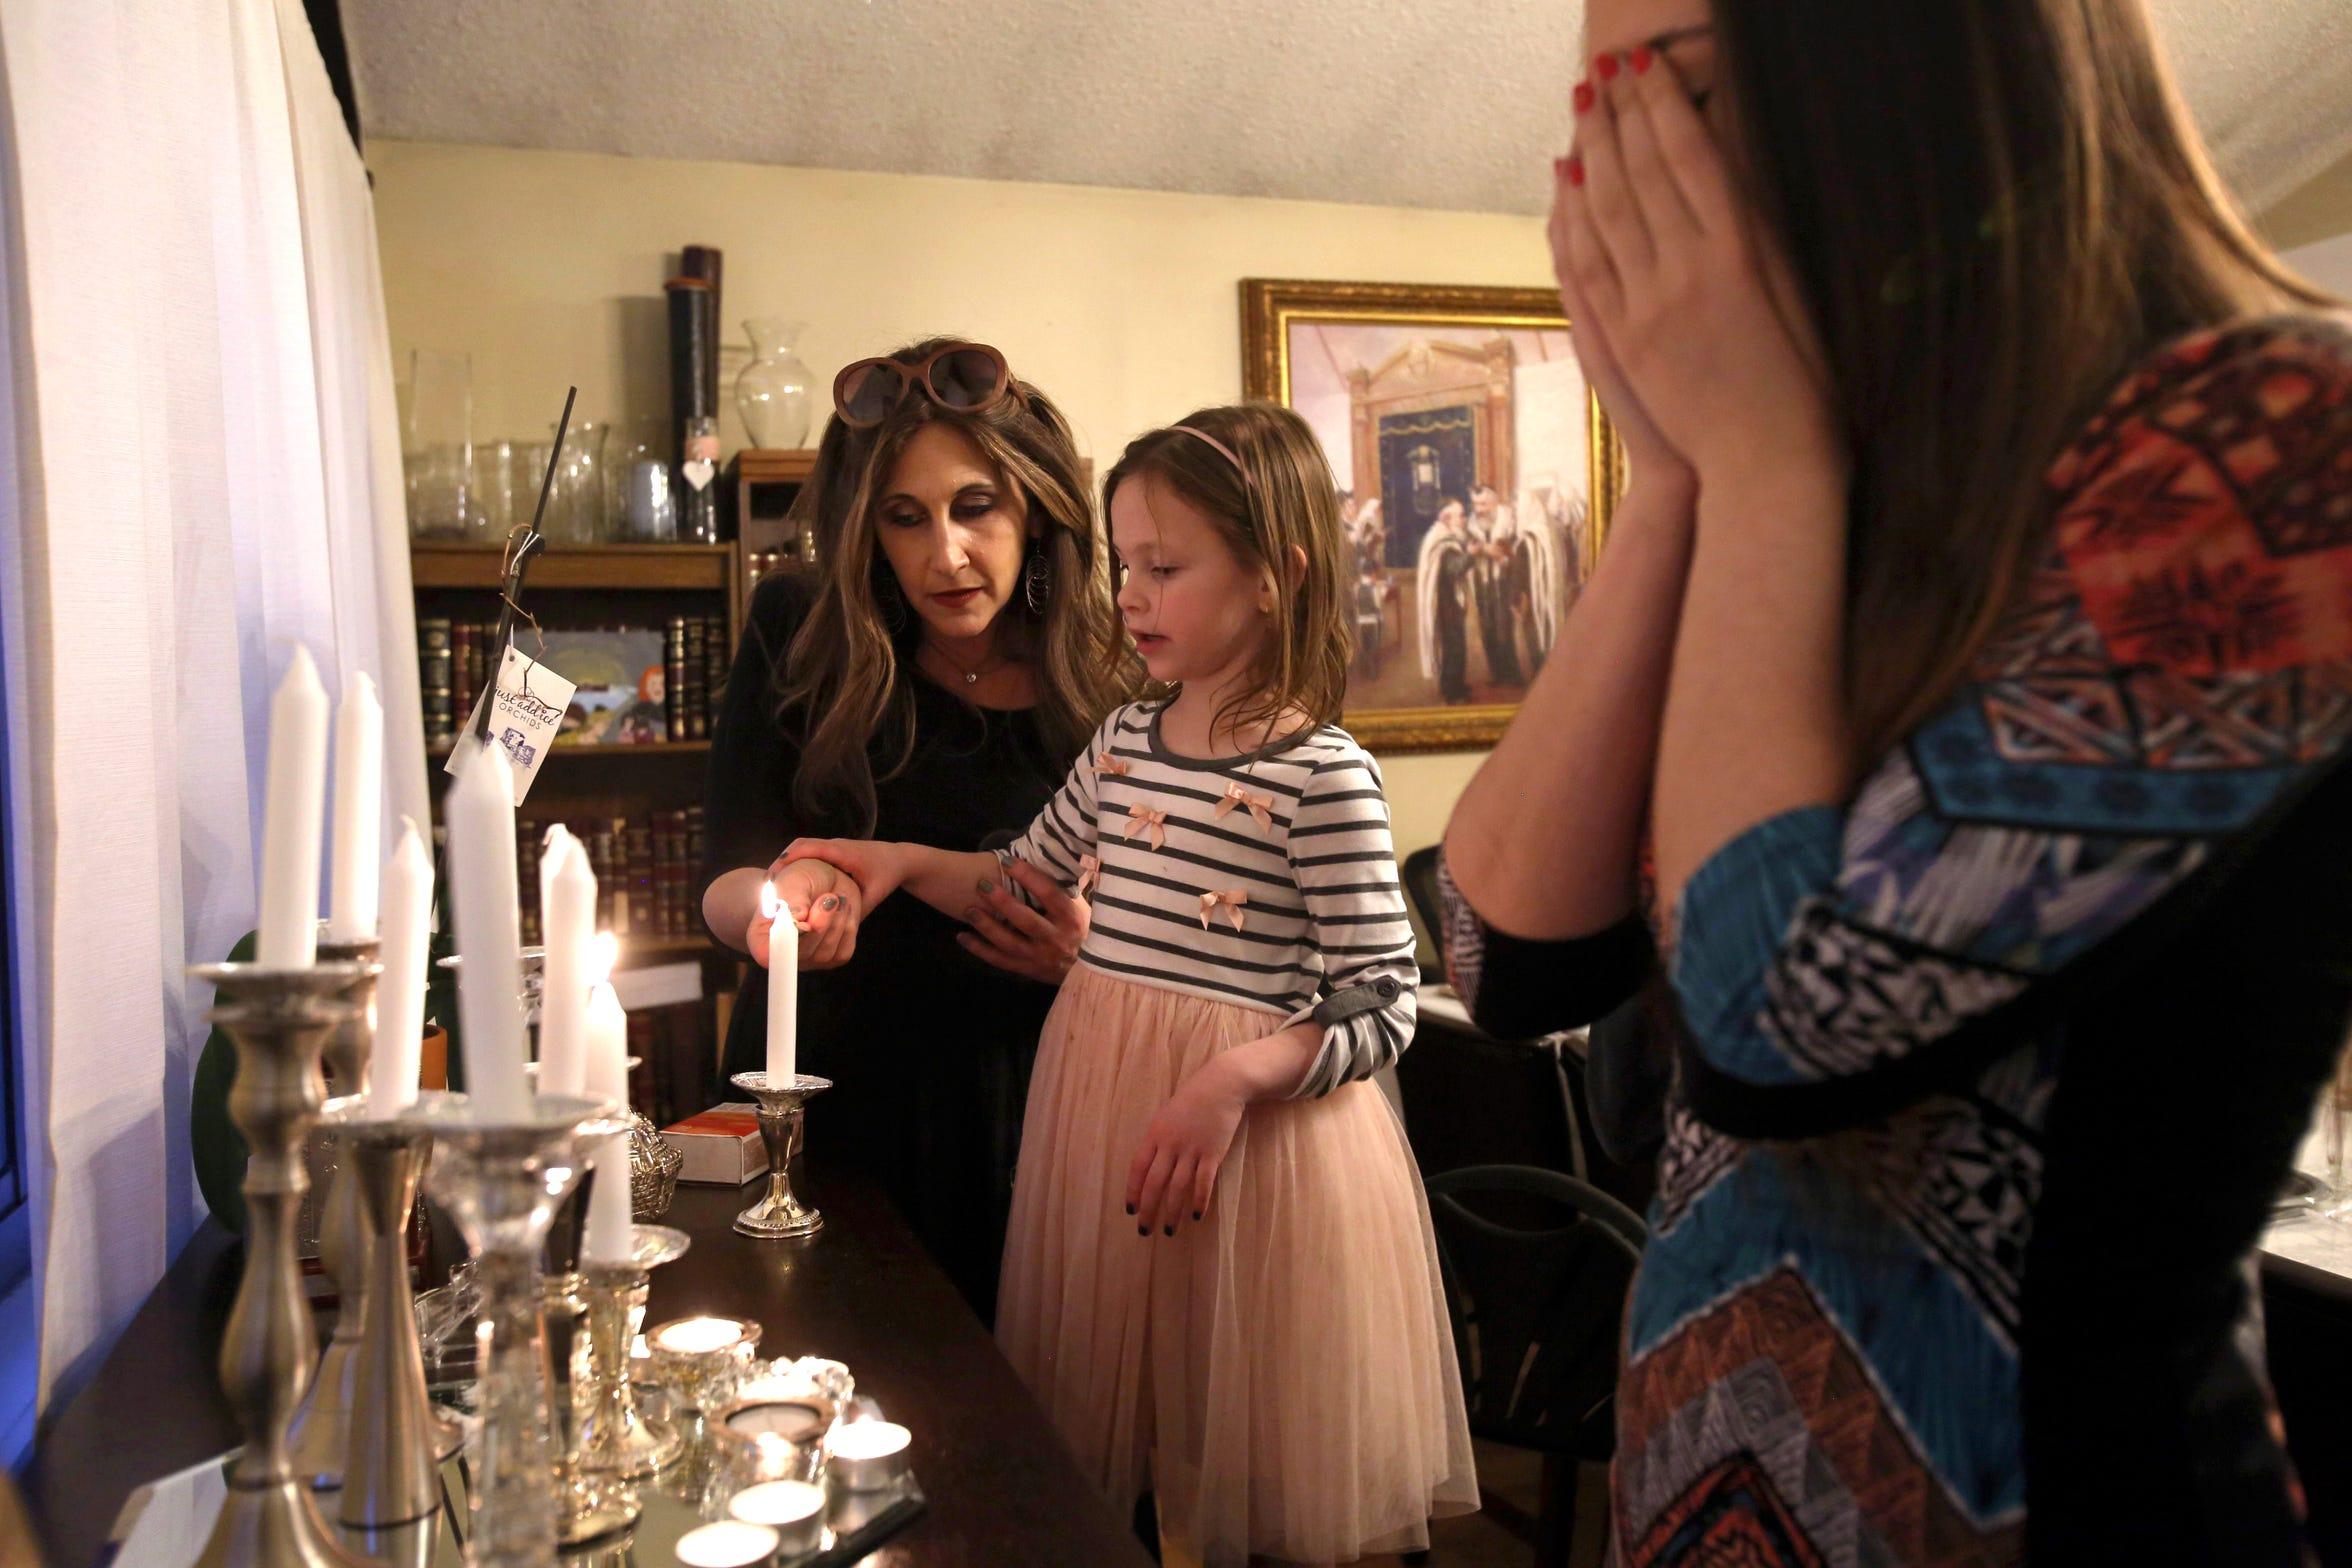 Bassie Friedman helps her daughter Devorah Leah Friedman, 6, light a candle during Shabbos as her son's girlfriend, Miriam Mitzman, recites a blessing Feb. 16, 2018 in Pomona.